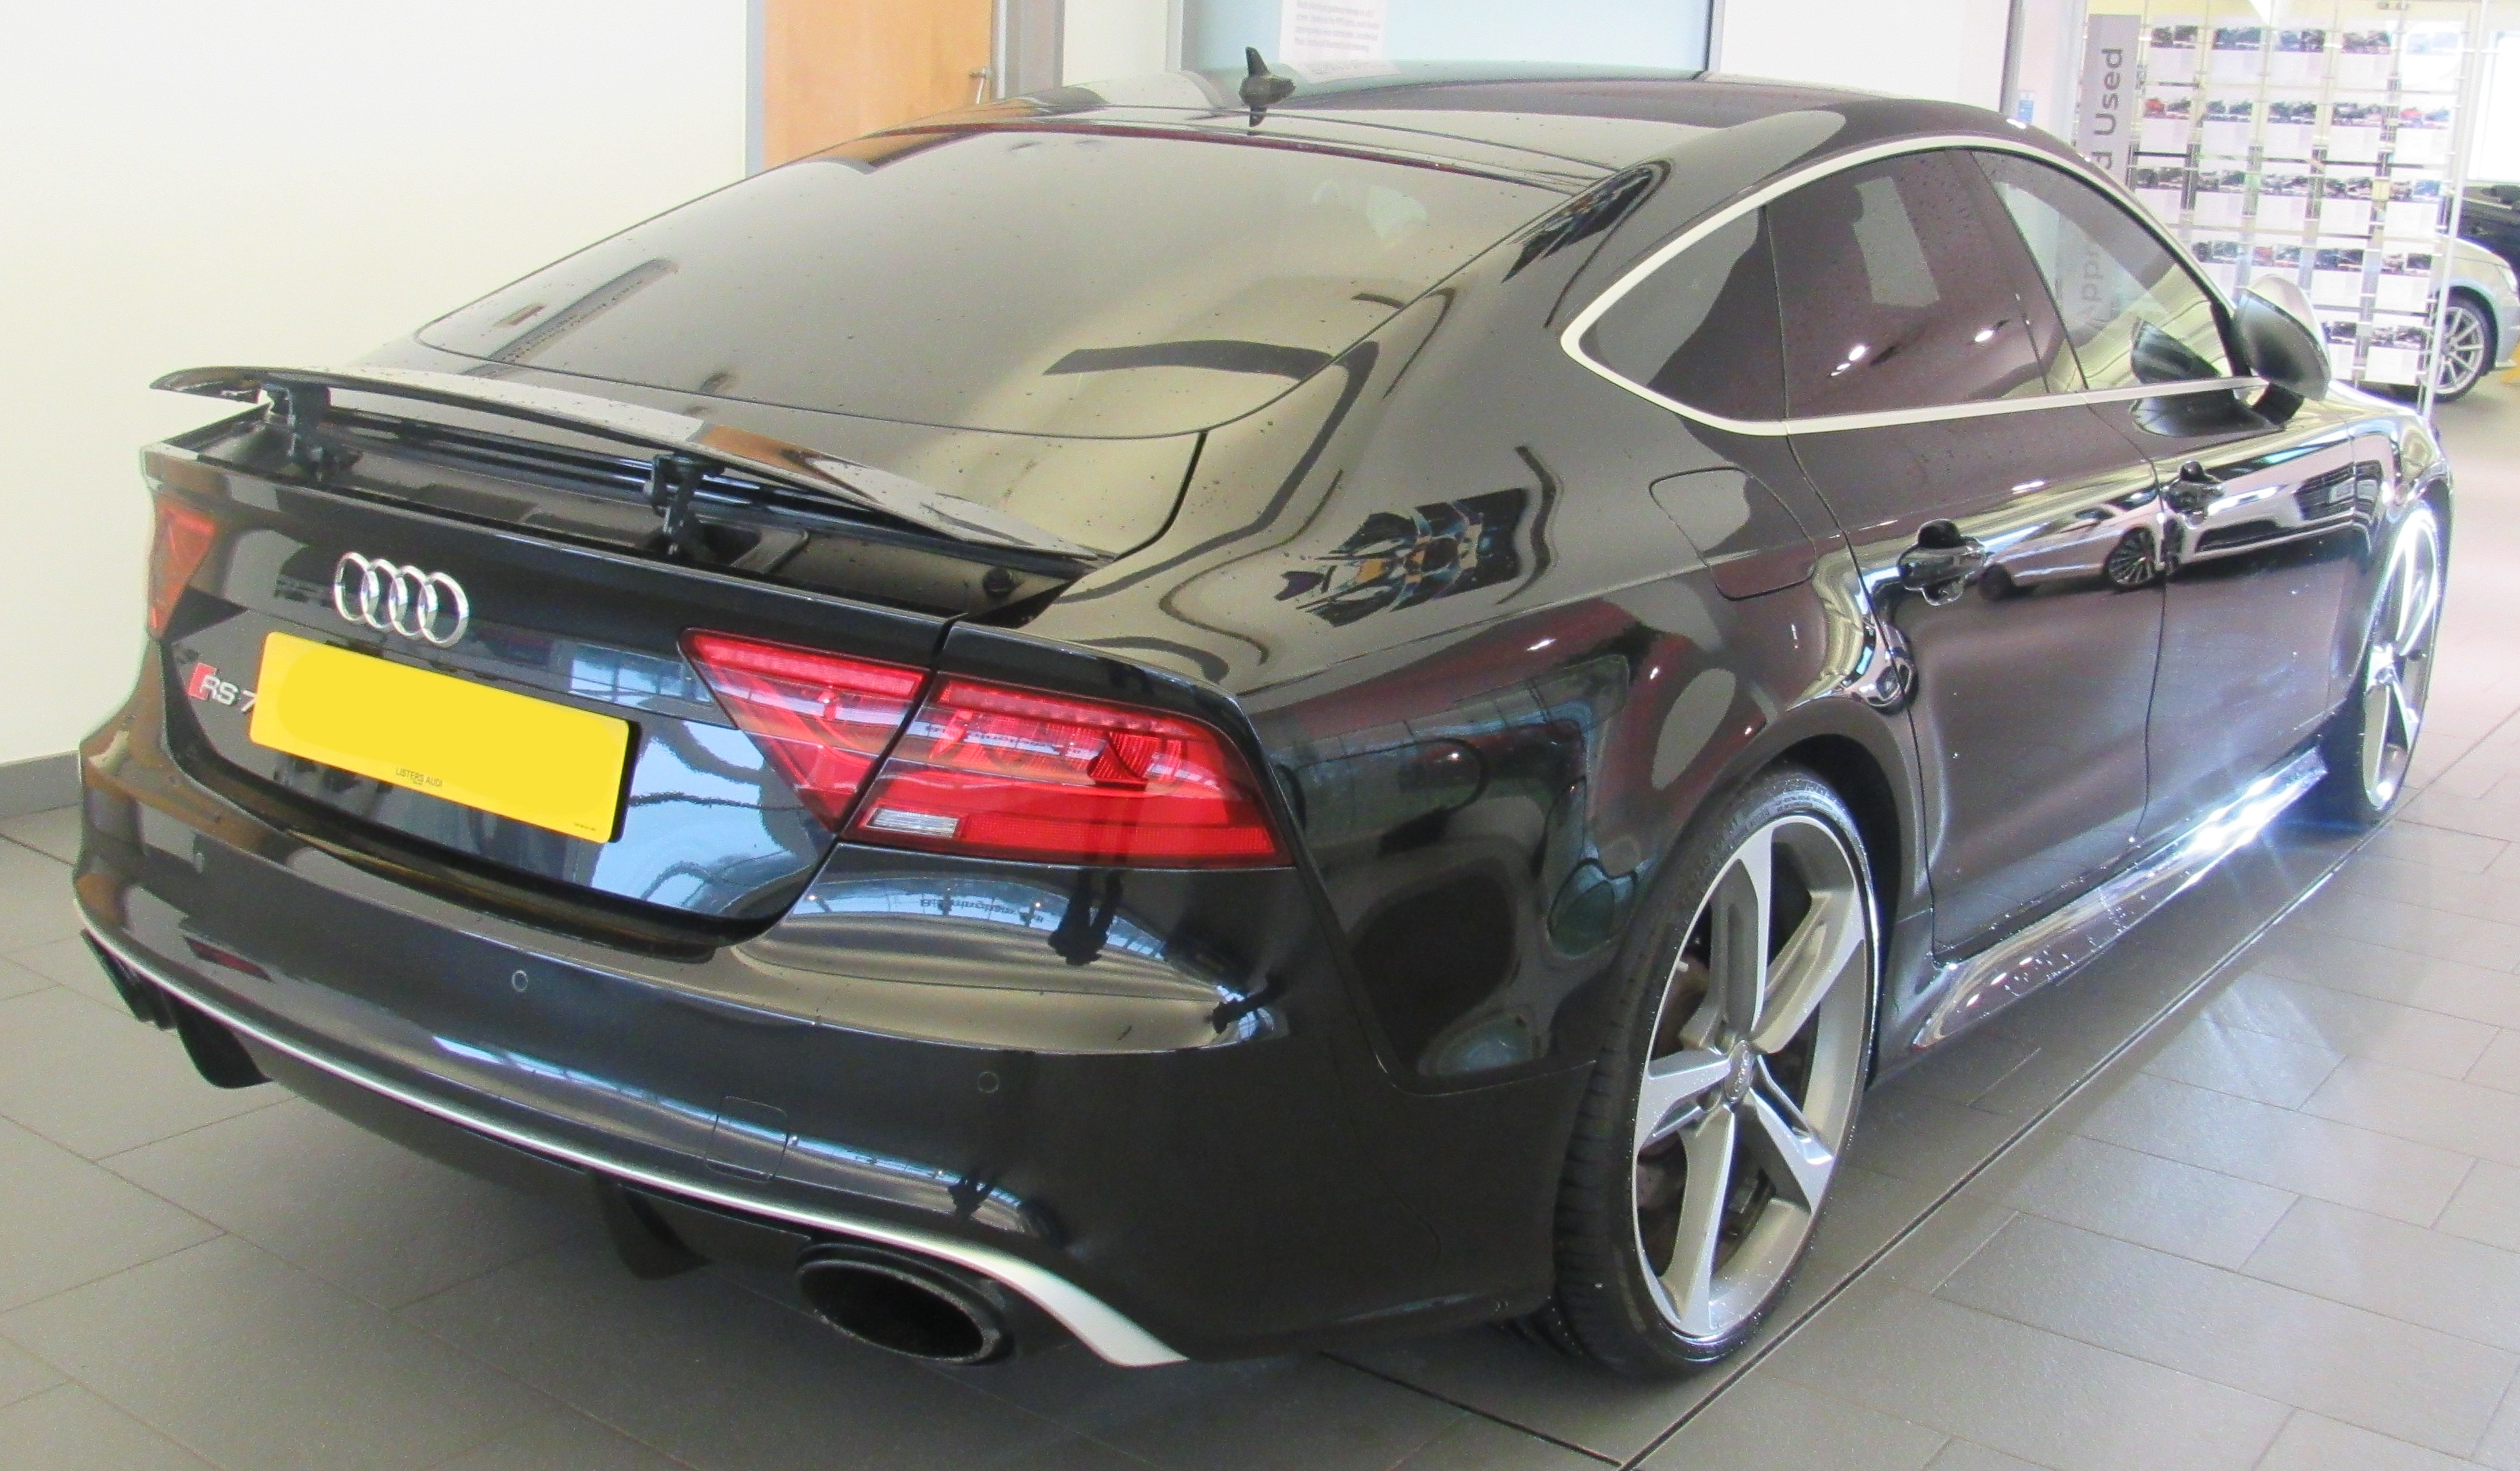 Výsledek obrázku pro Audi rs7